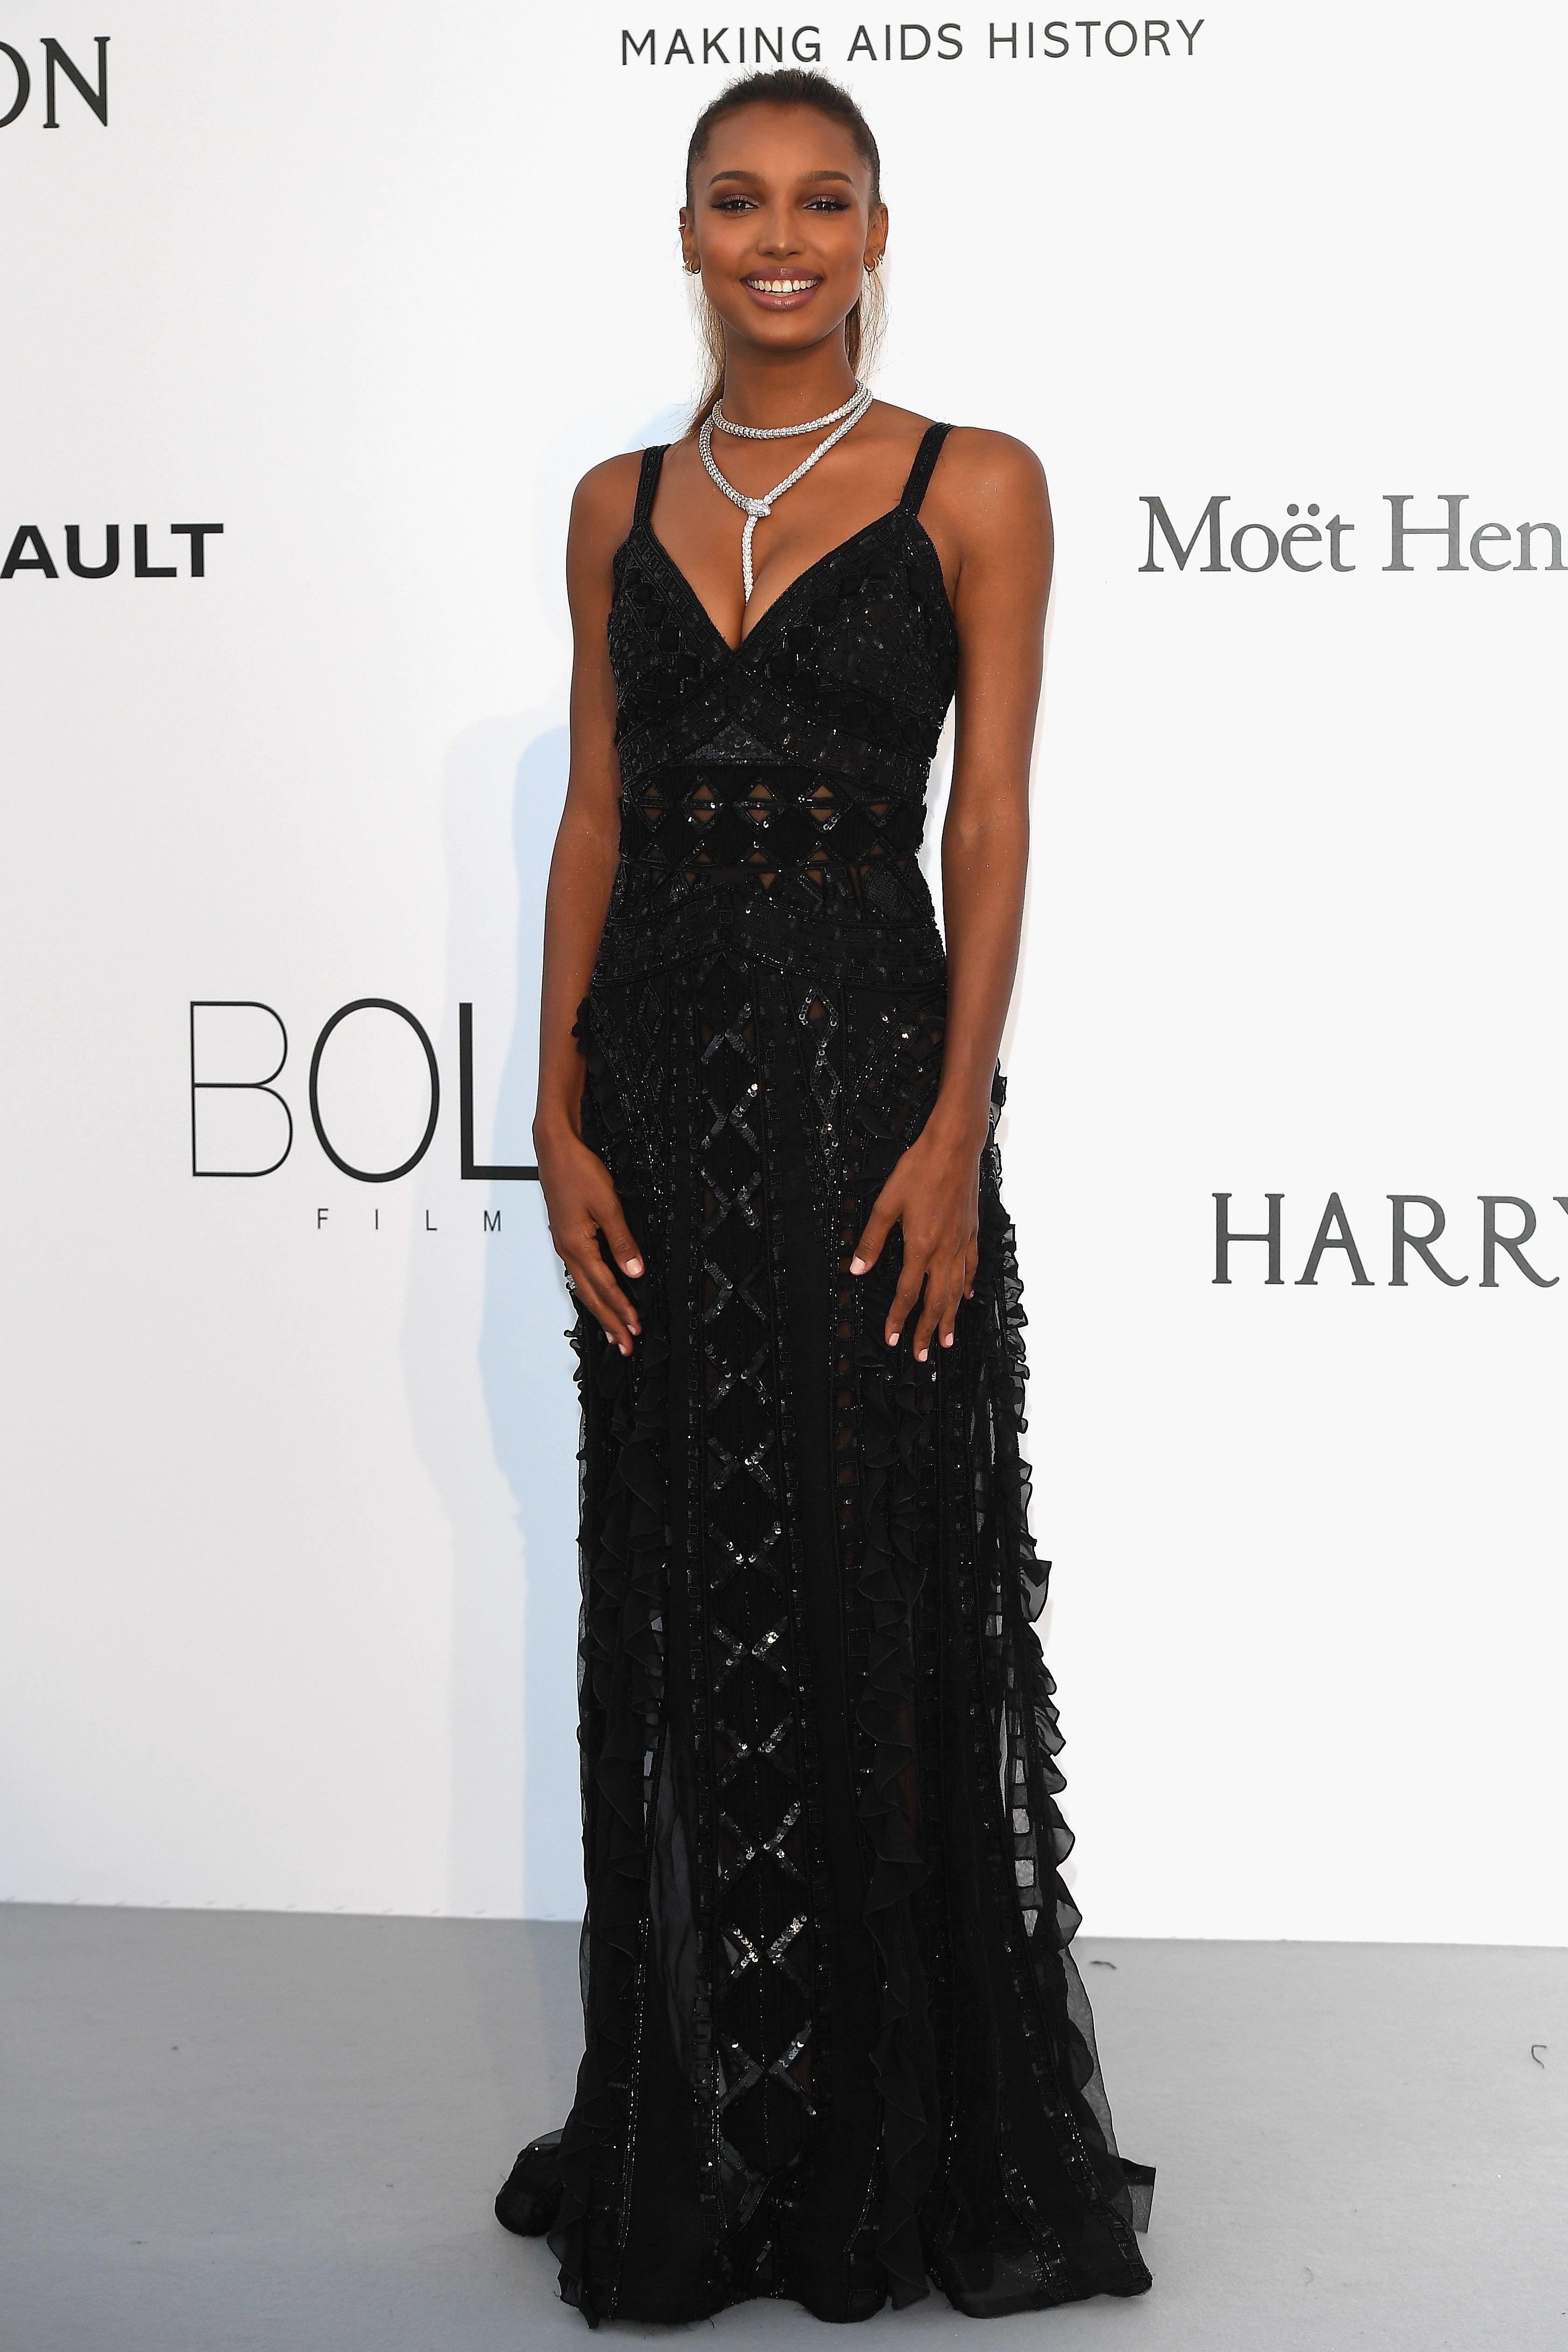 7d633c31318 Jasmine Tookes arrives at the amfAR Gala Cannes 2017 at Hotel du Cap-Eden-Roc  in Cap d Antibes